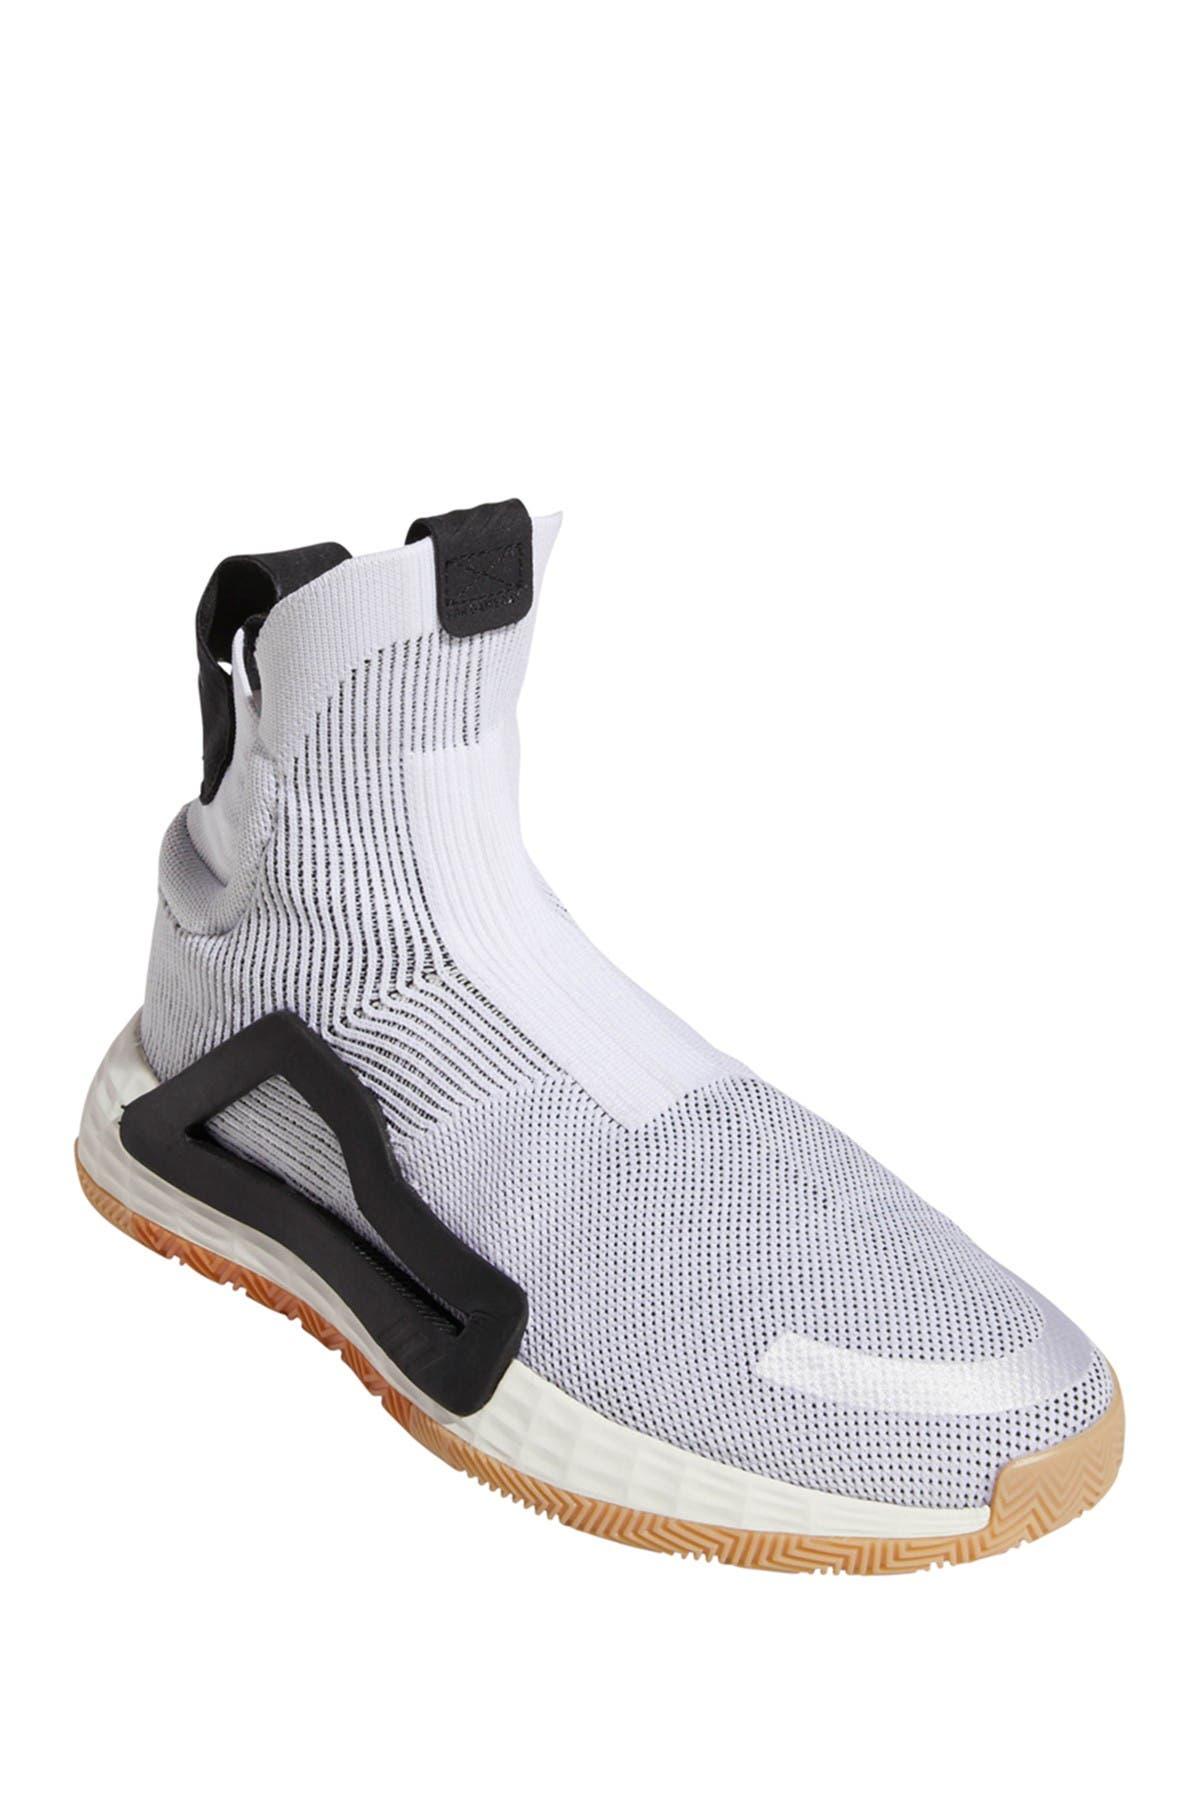 adidas | N3XT L3V3L Knit Basketball